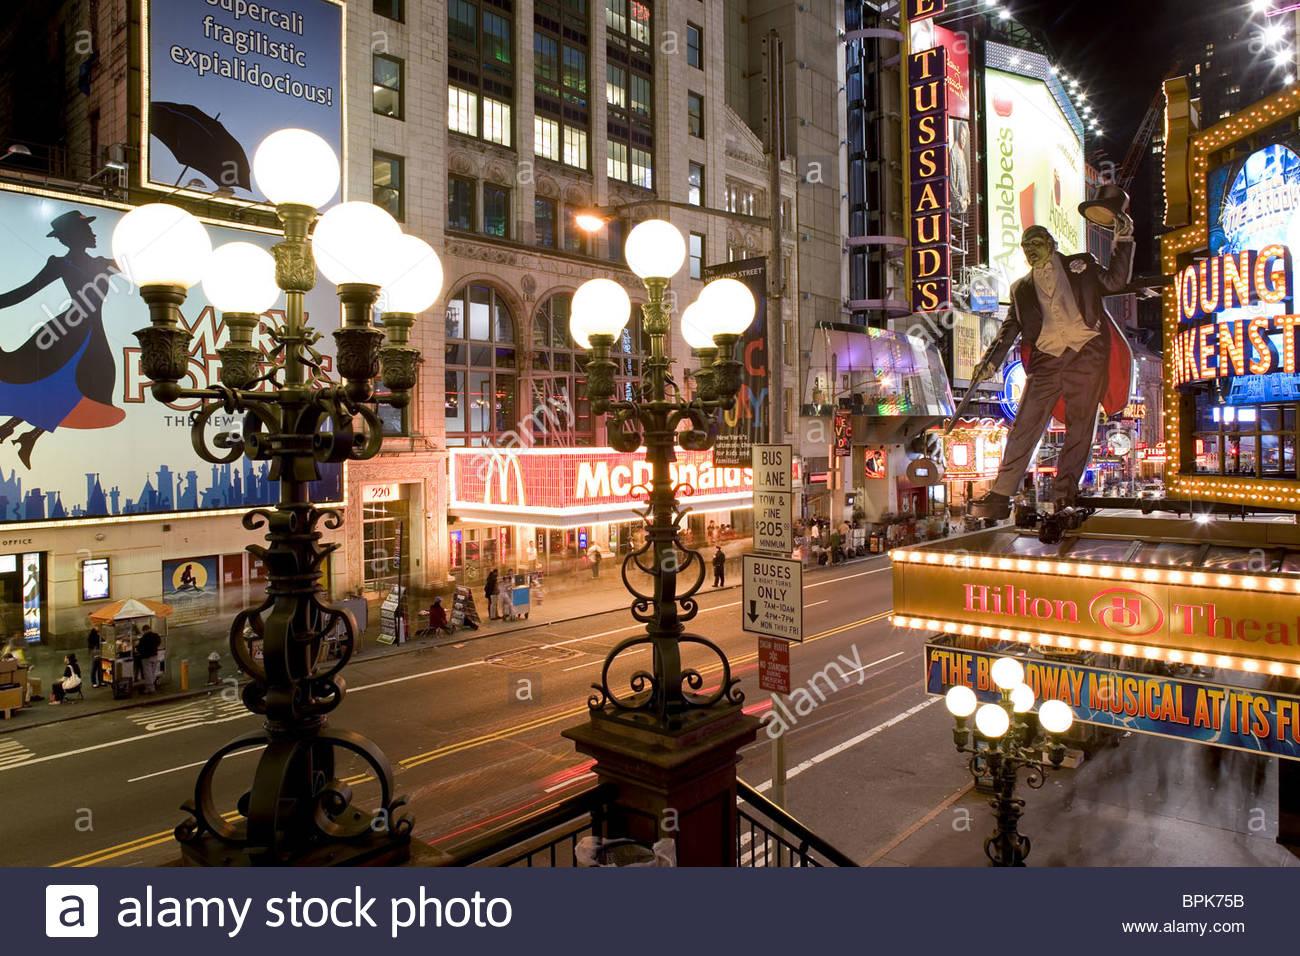 42nd Street, Times Square, Downtown Manhattan, New York City, New York, North America, USA - Stock Image